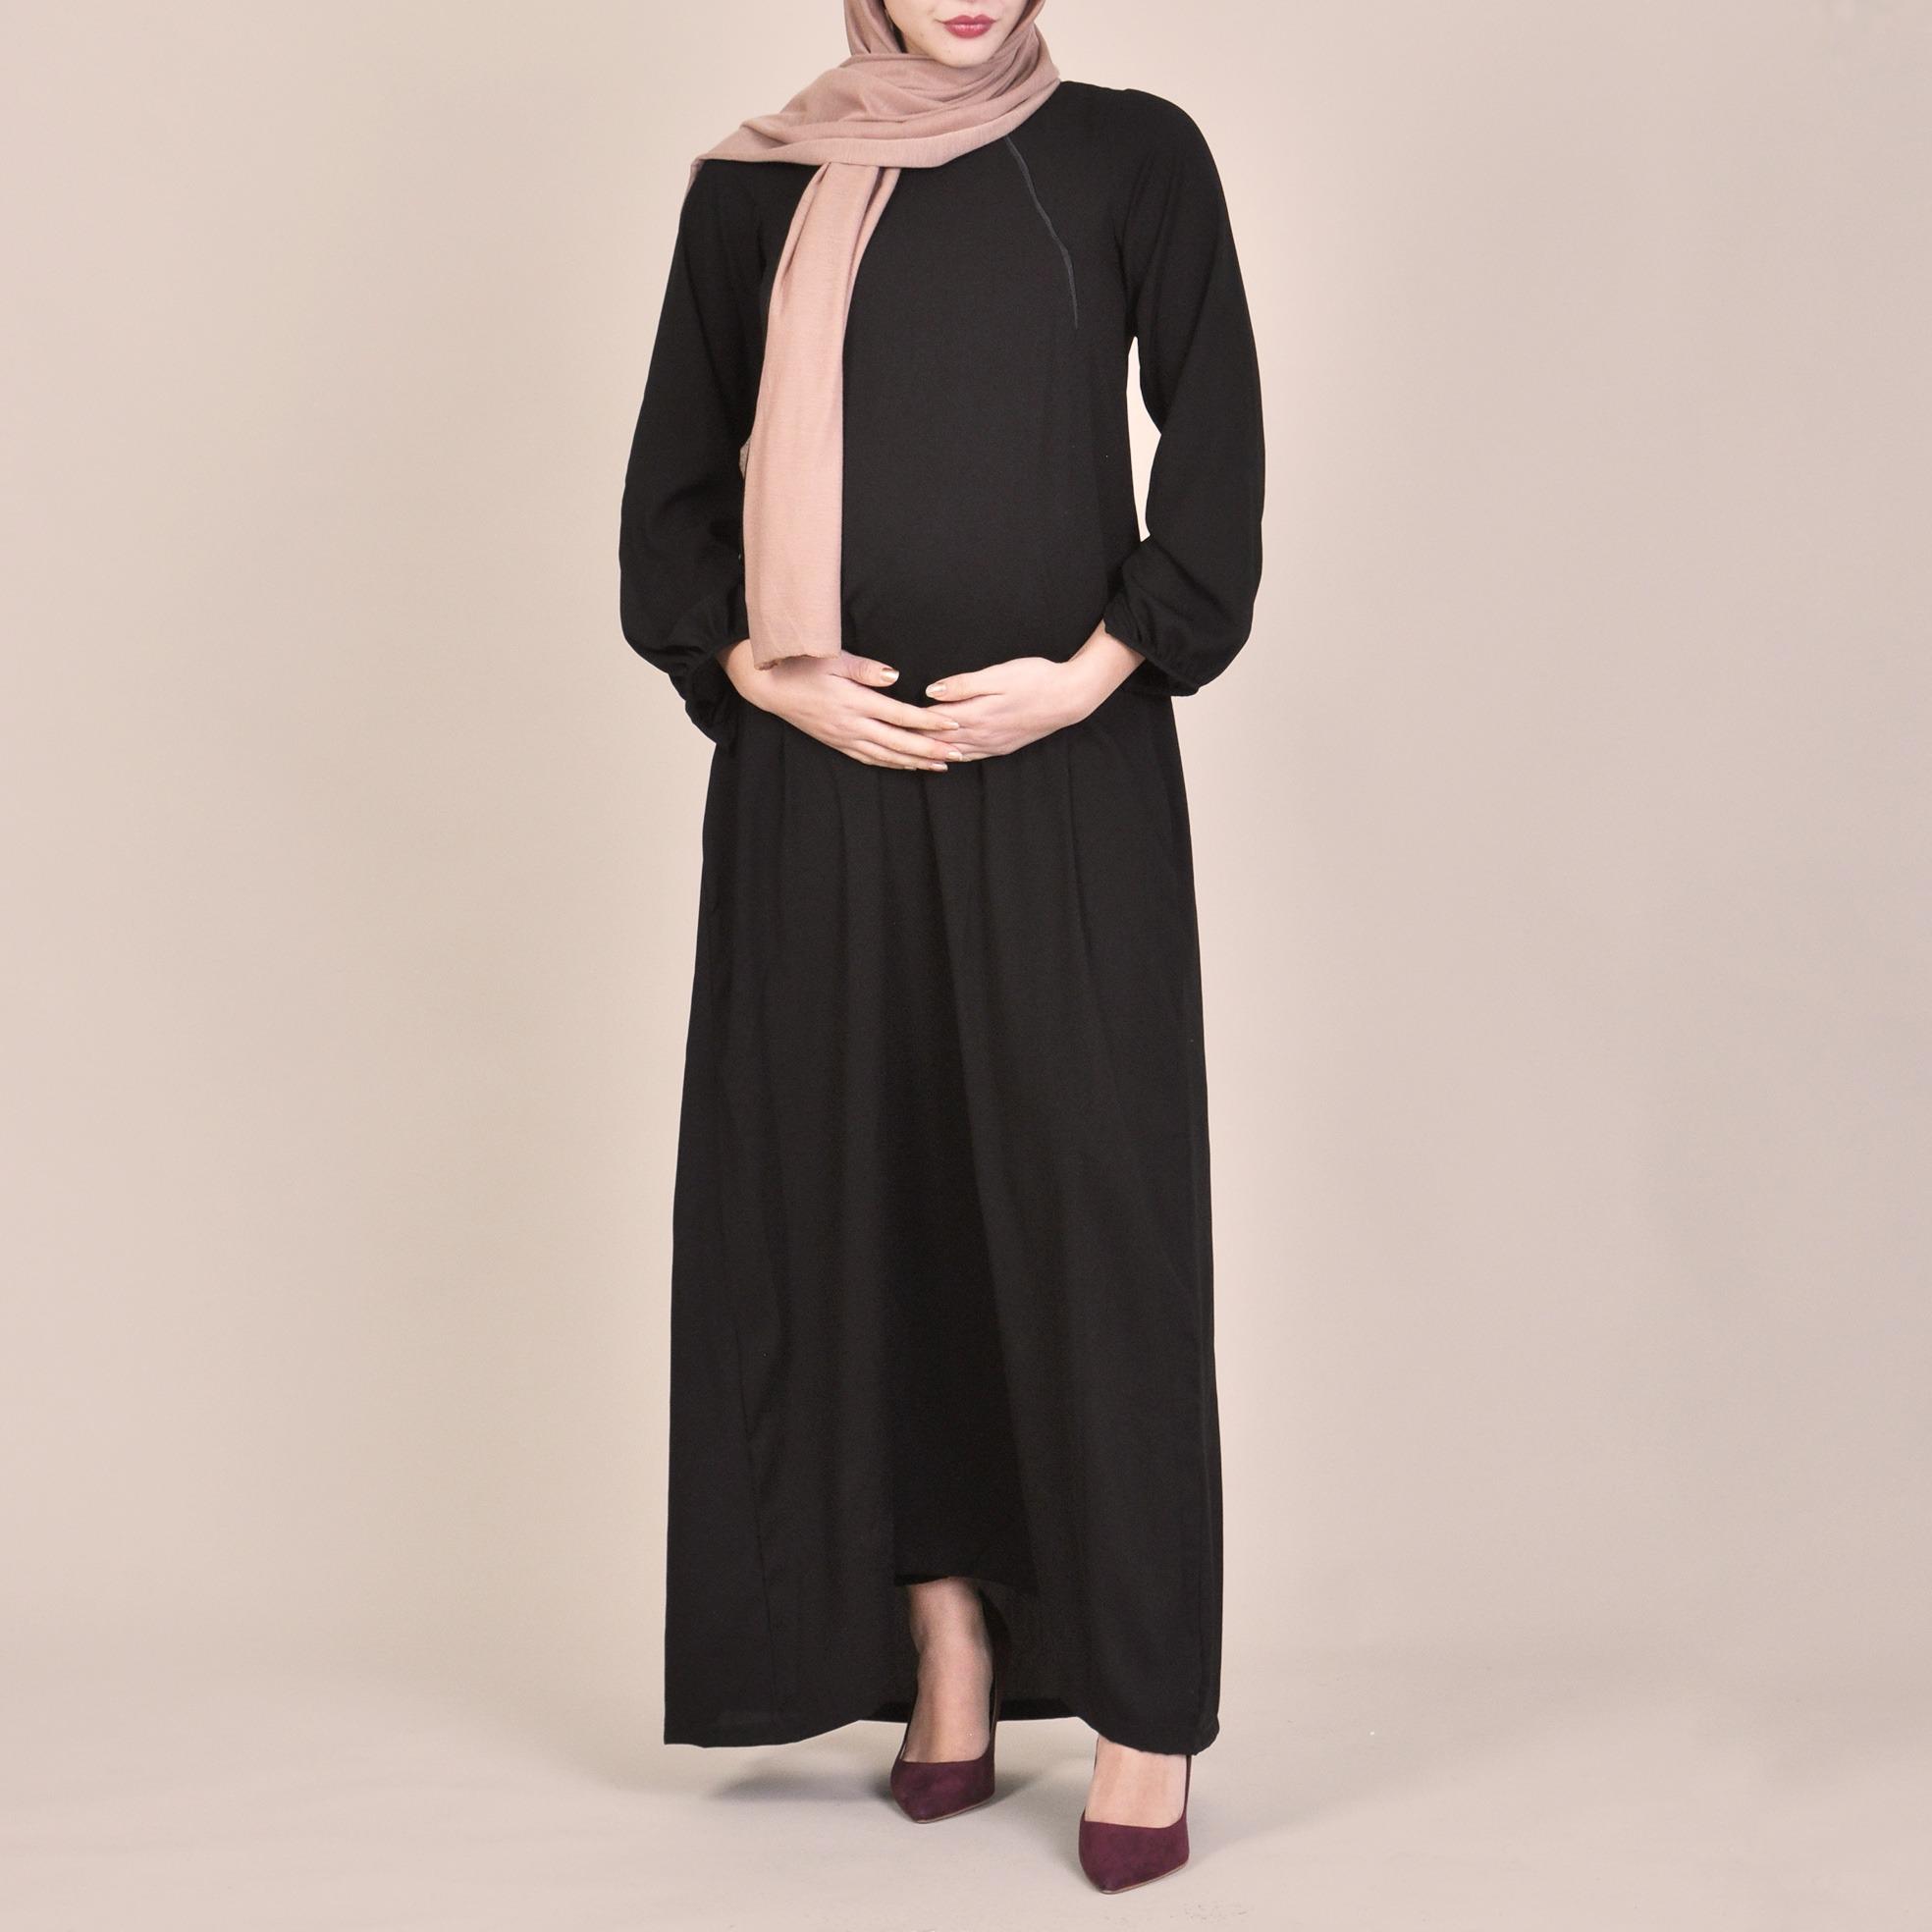 ace70e5511f3d Zaniah | Classic Black Modest Maternity Abaya Shop Online | BIAH